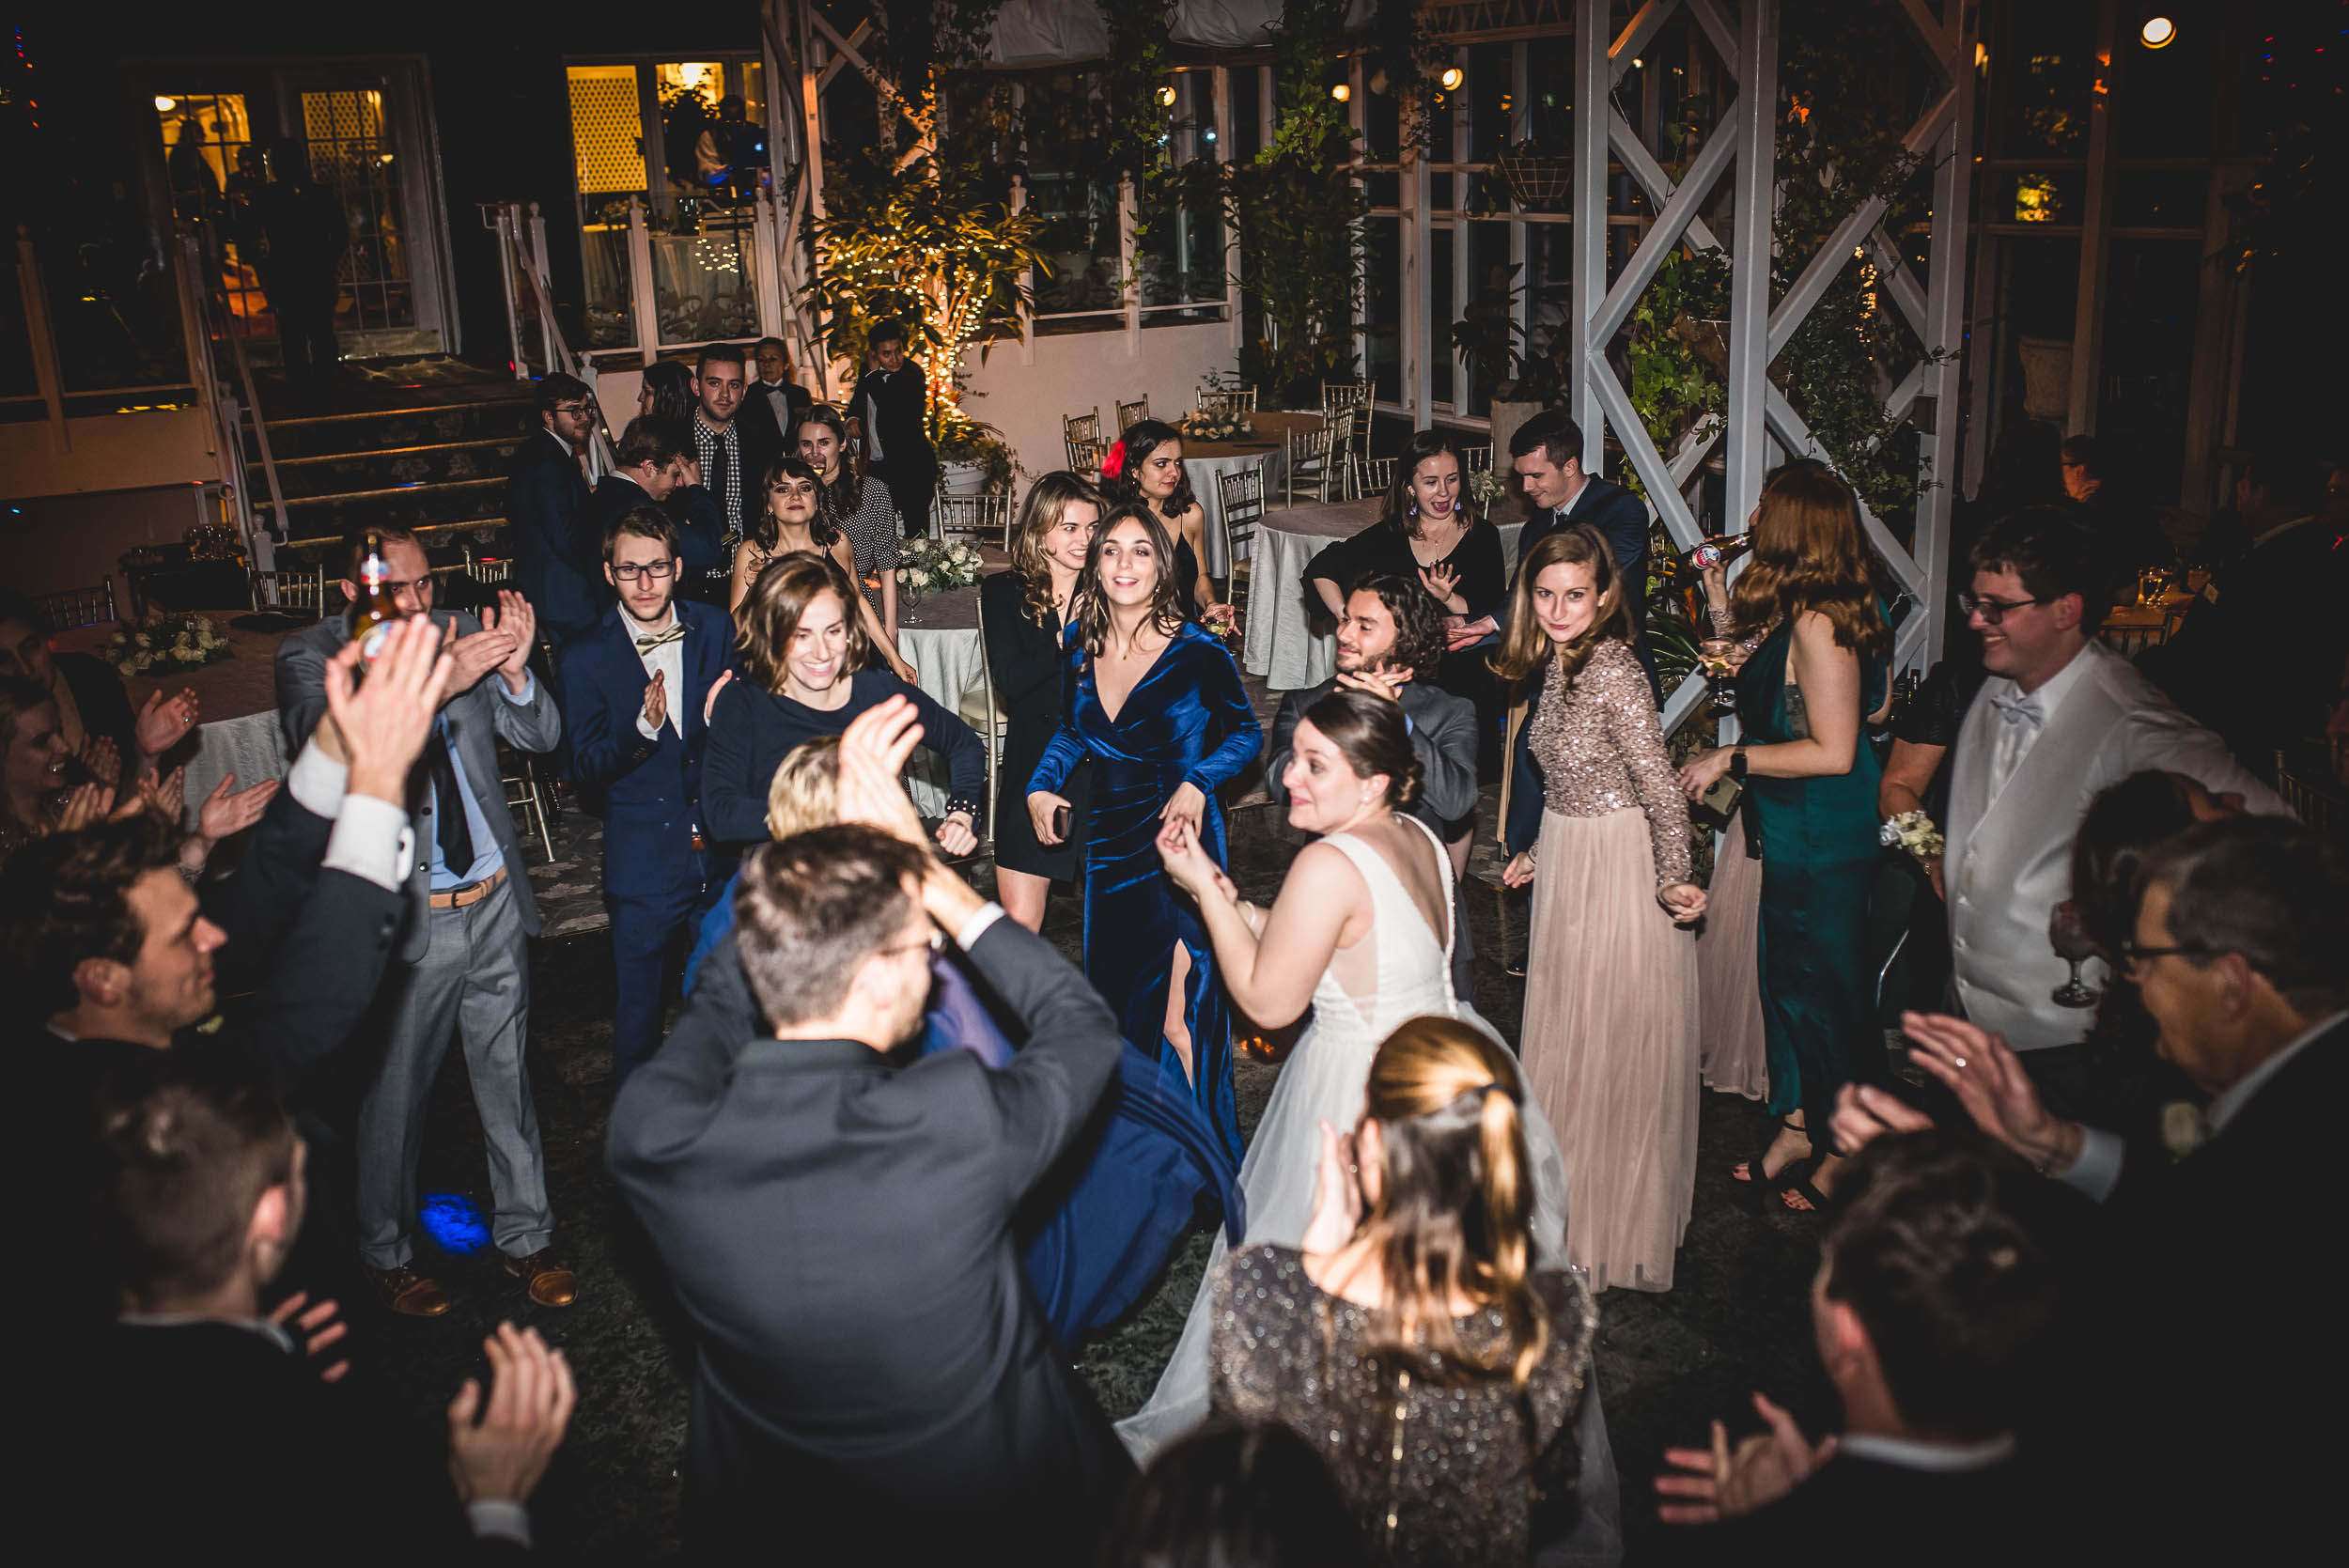 katie_mathia_wedding_Church_assumption_madison_hotel_morristown_new_jersey(8of1).jpg